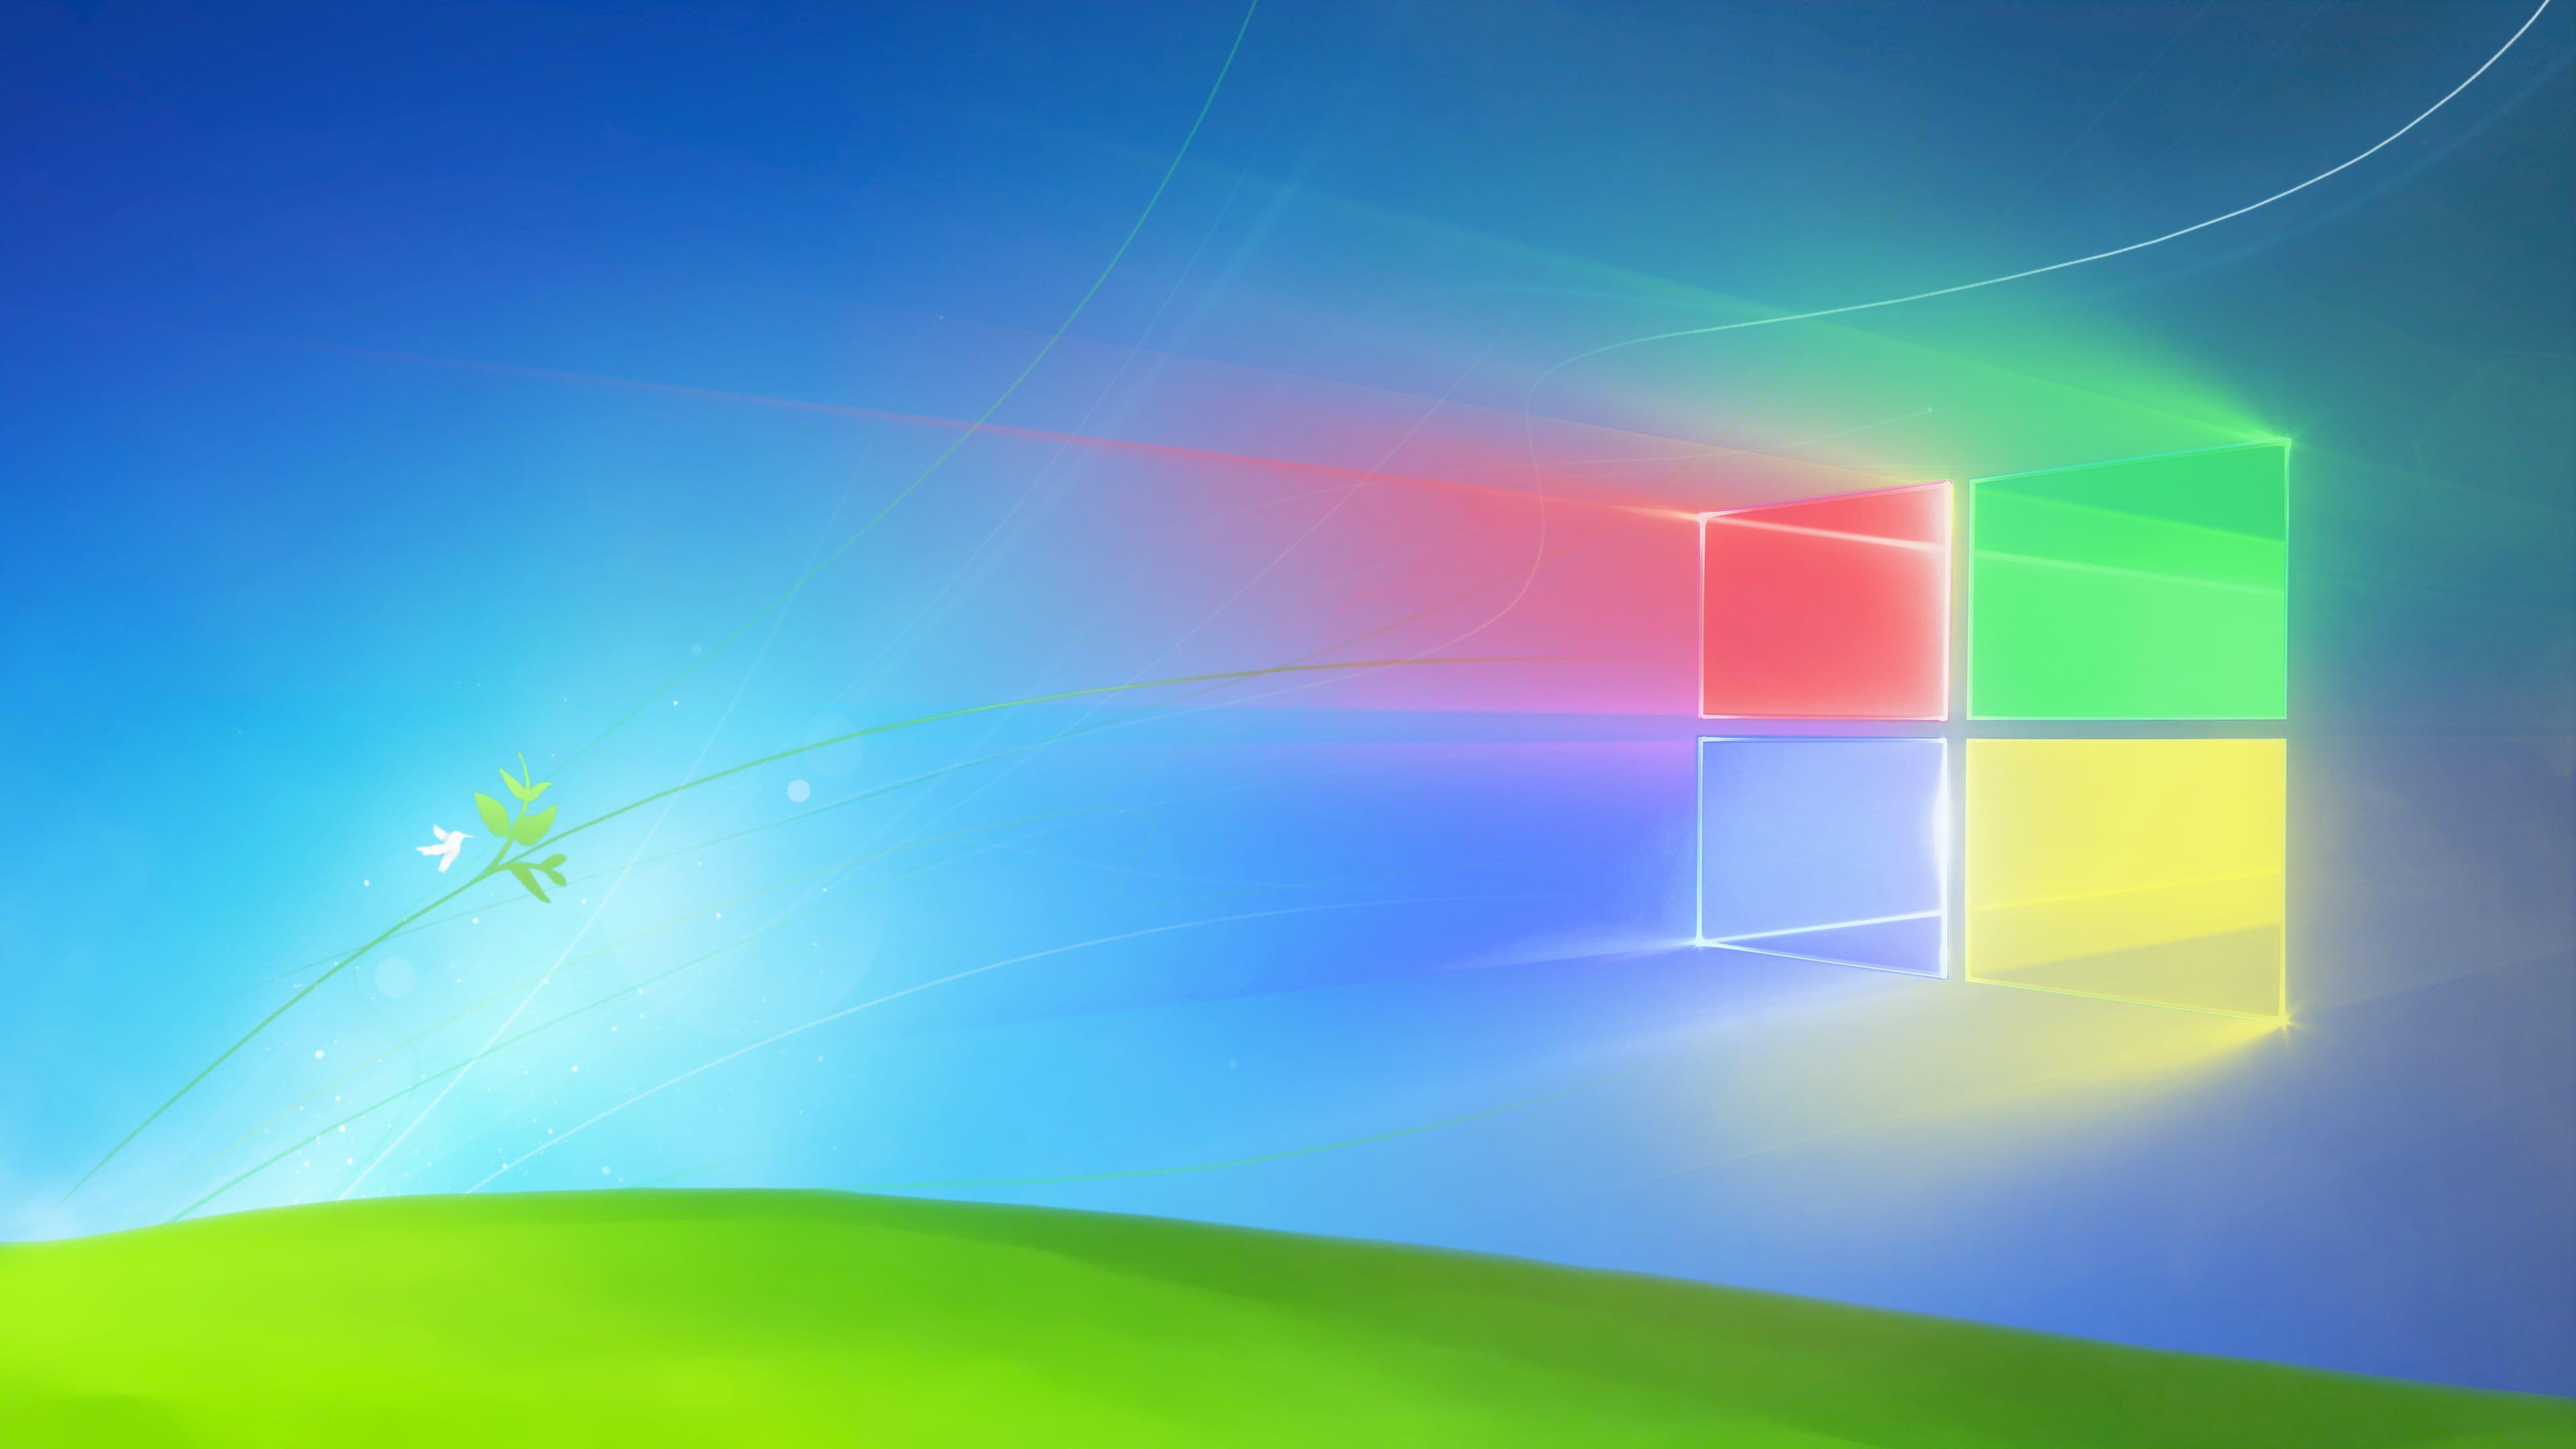 Windows 10 Windows Vista Operating System Technology Windows 7 Windows 8 Glass Design Micro Microsoft Wallpaper Computer Wallpaper Desktop Wallpapers Windows